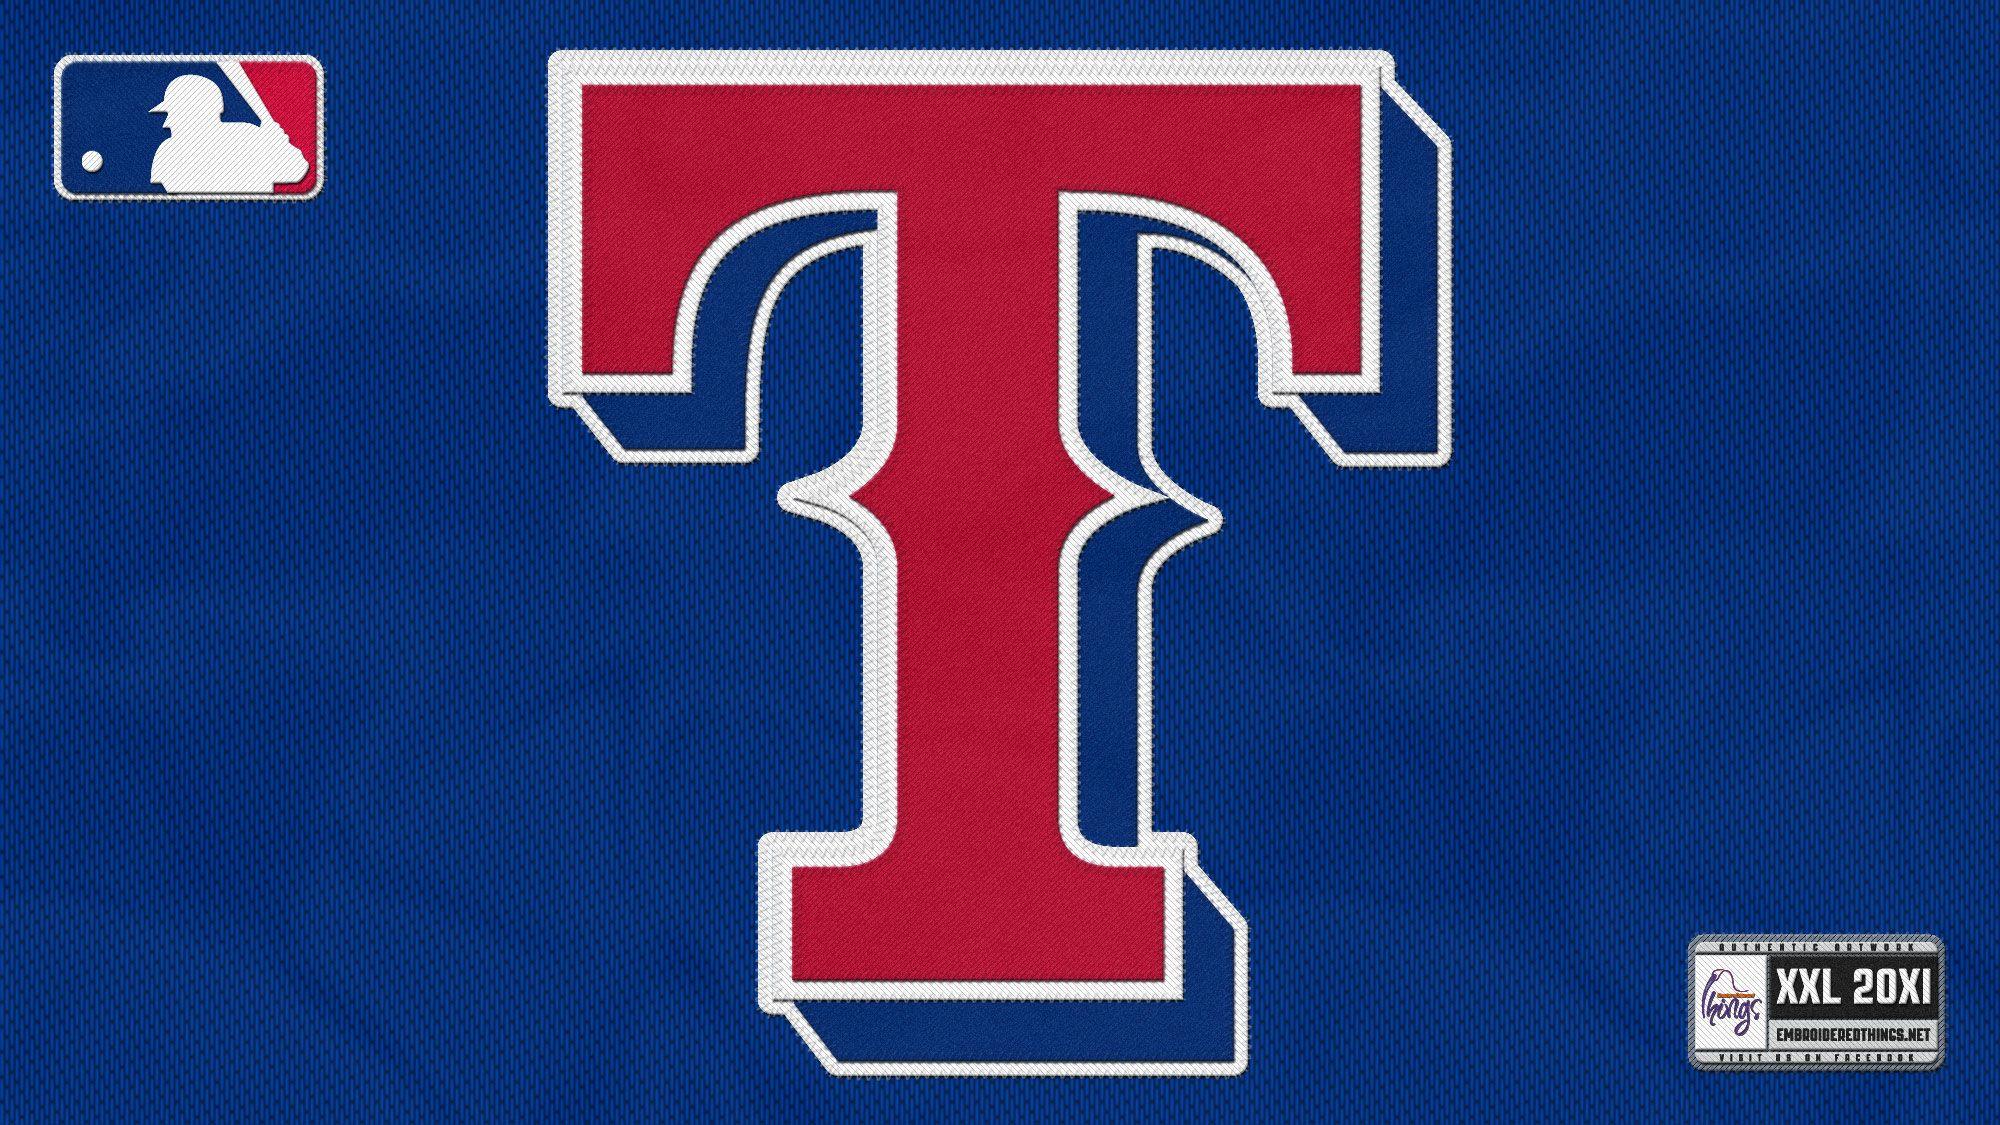 Texas Rangers Wallpaper Themepack for Windows 480—800 Texas Rangers